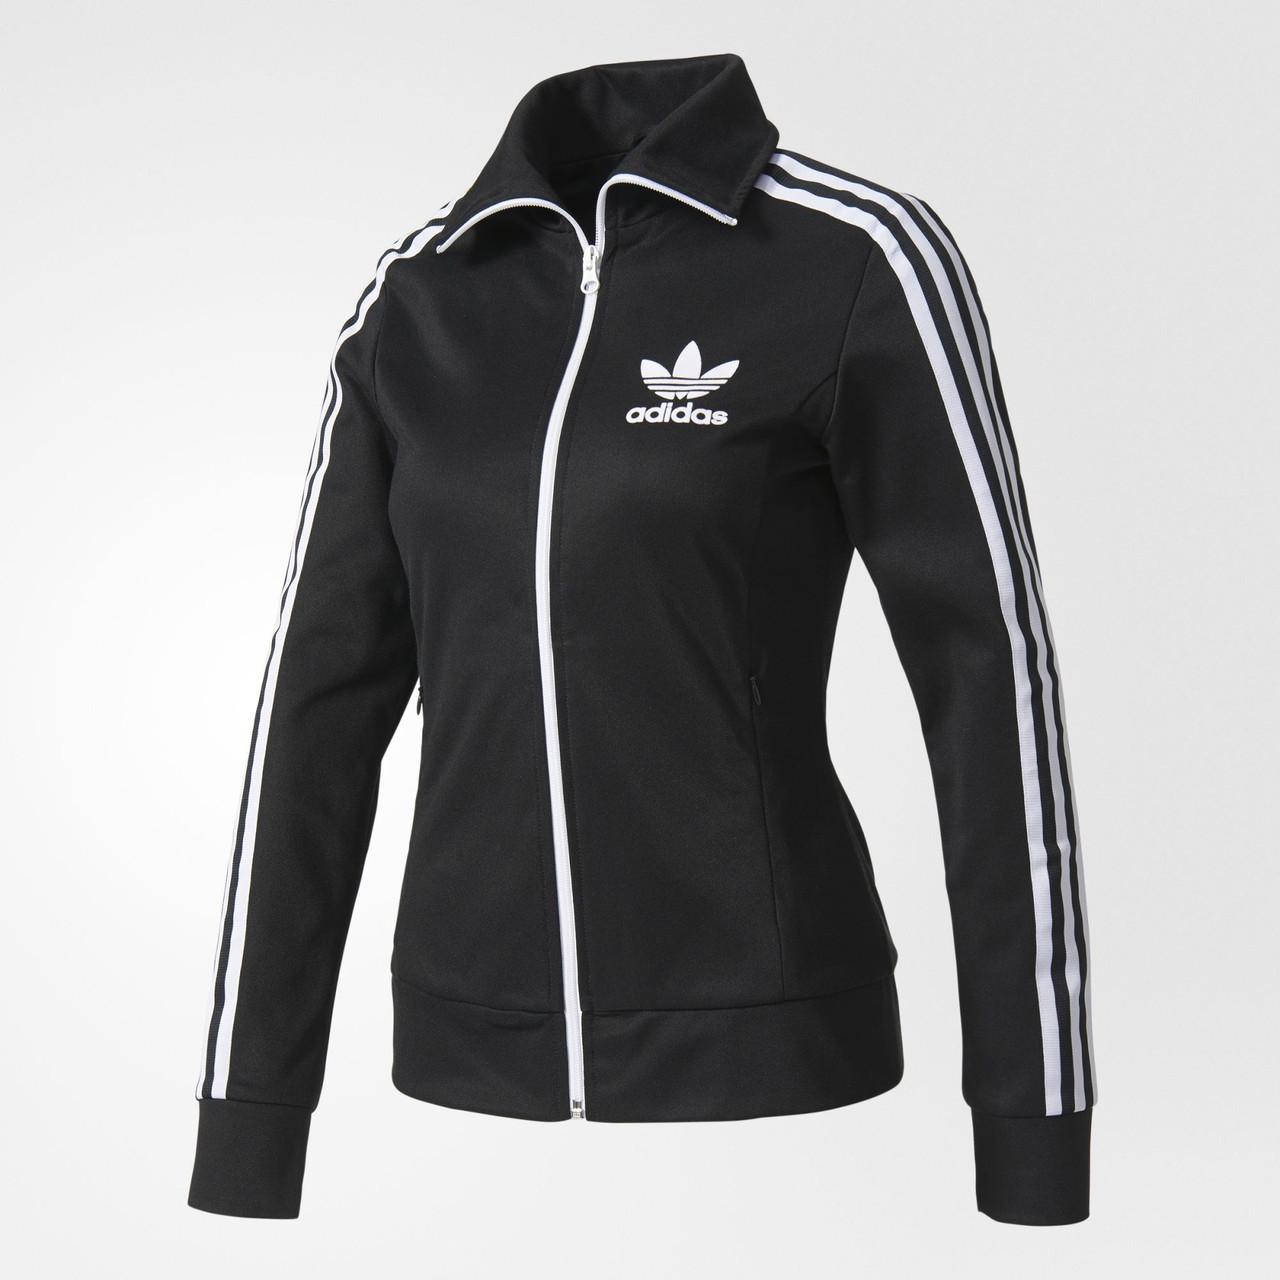 2b0153f569a9 Женская олимпийка Adidas Originals Europa (Артикул  BK5936) - Интернет- магазин «Эксперт